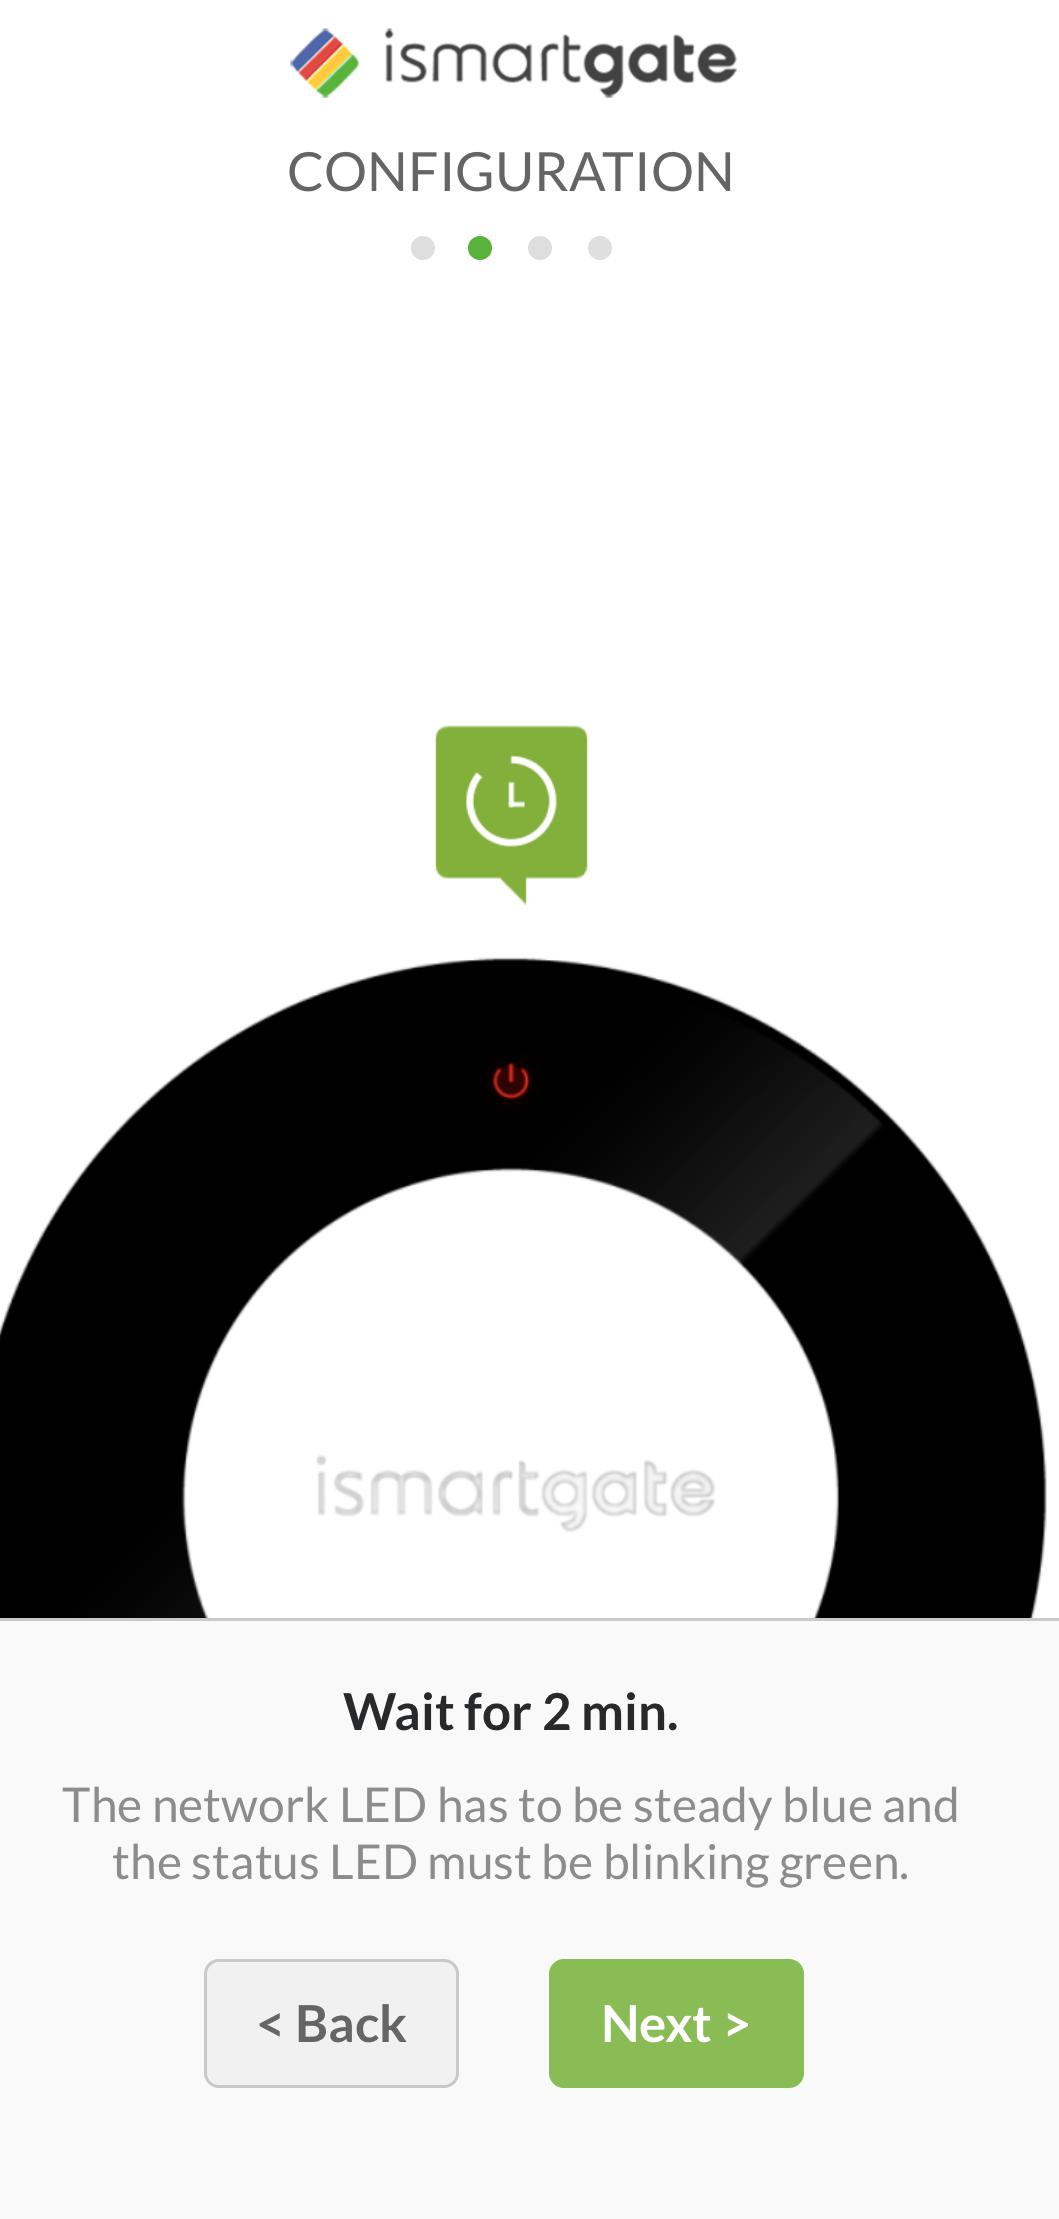 ismartgate LITE config